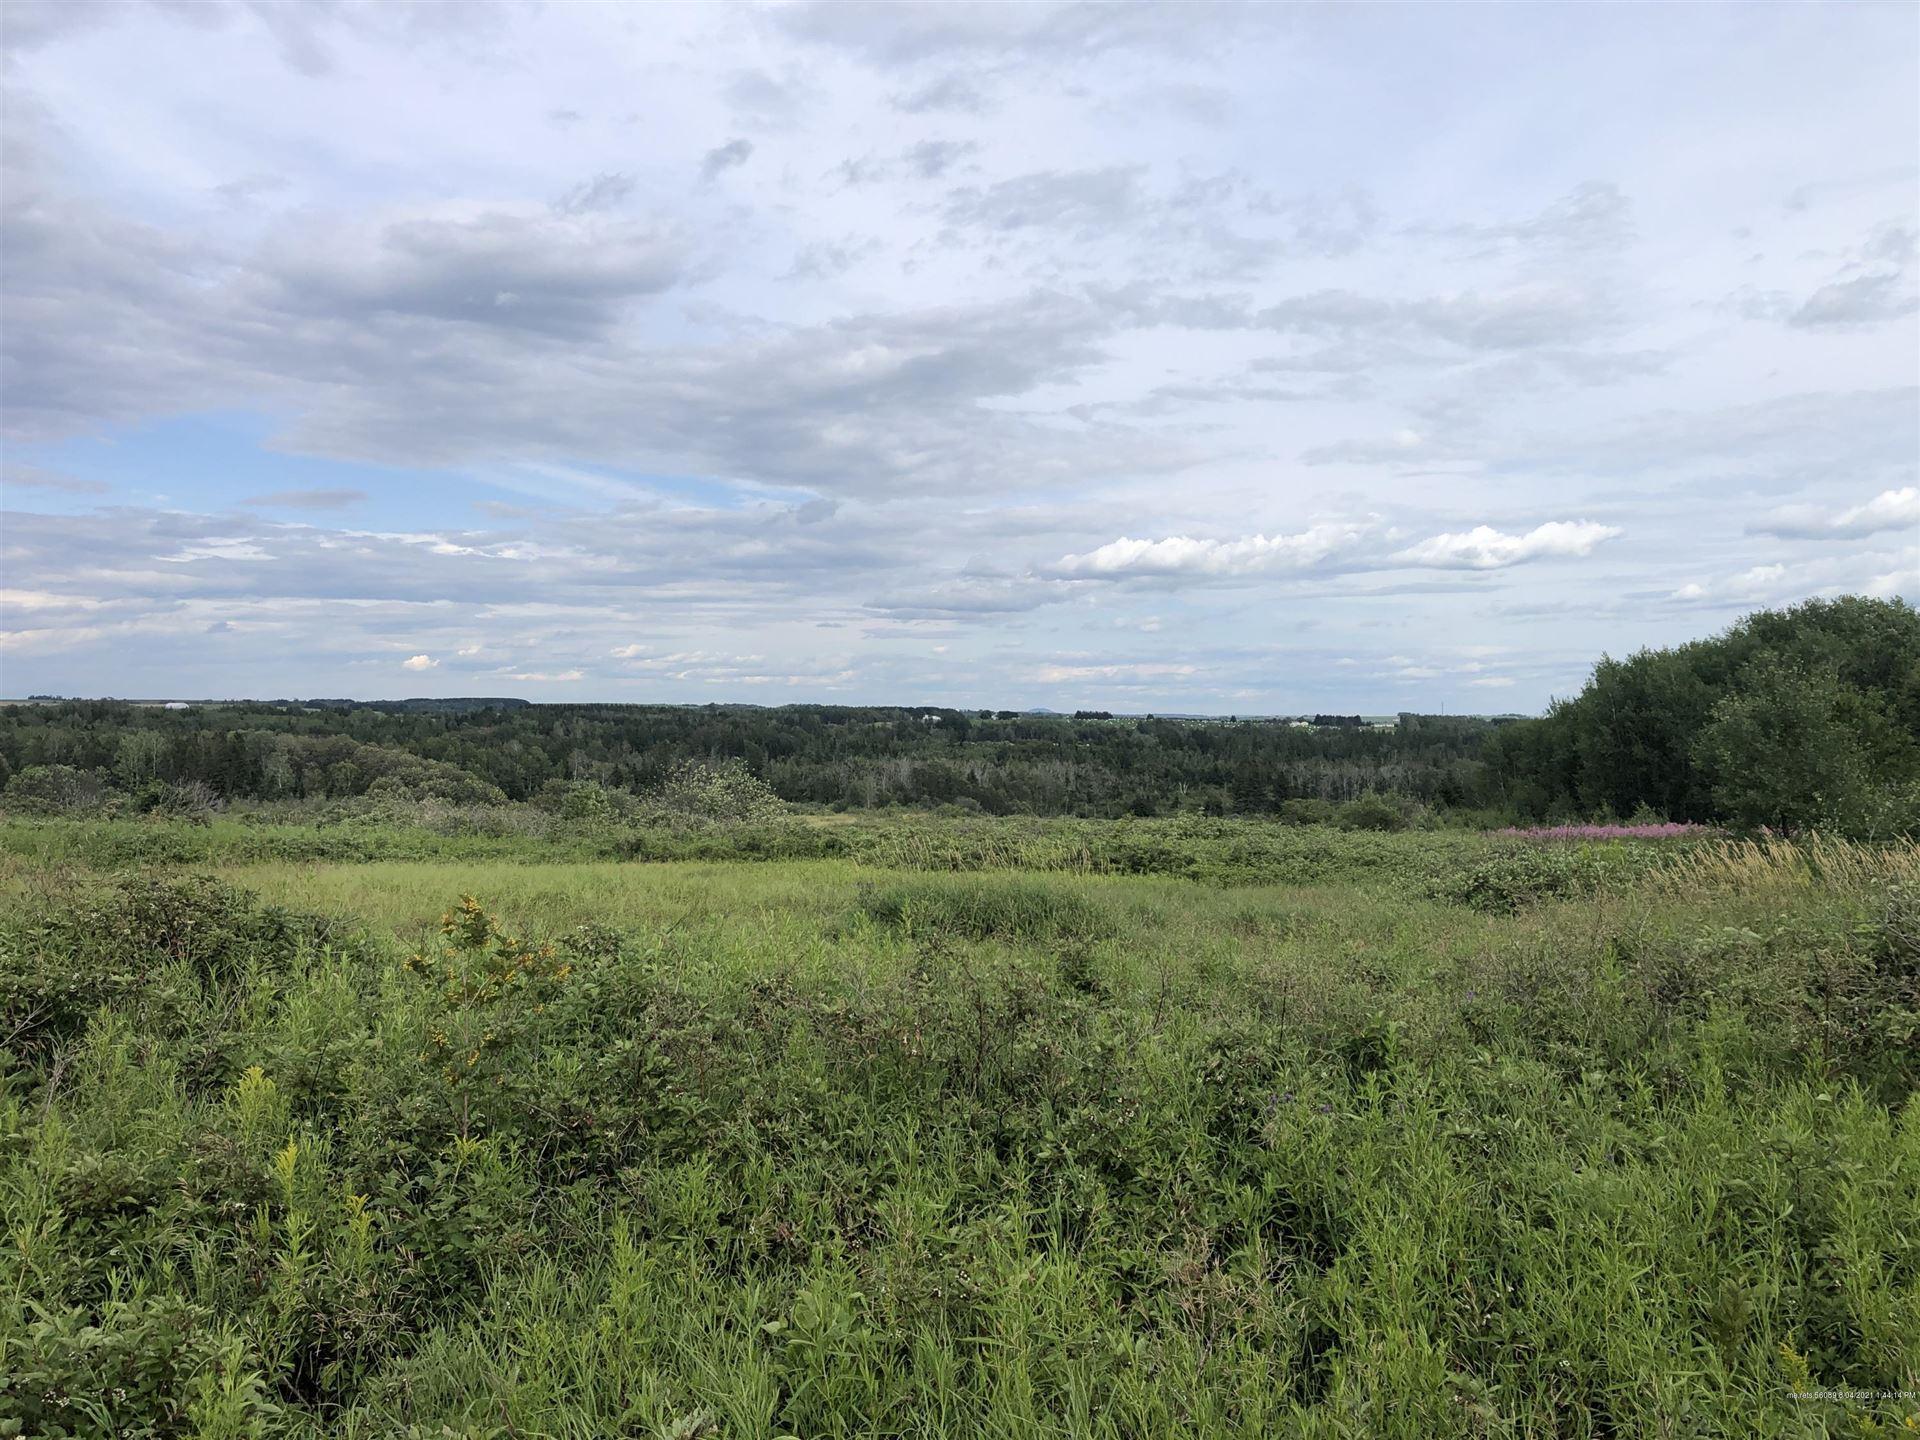 Photo of Map 6 Lot 27 Thibodeau Road, Woodland, ME 04736 (MLS # 1503081)